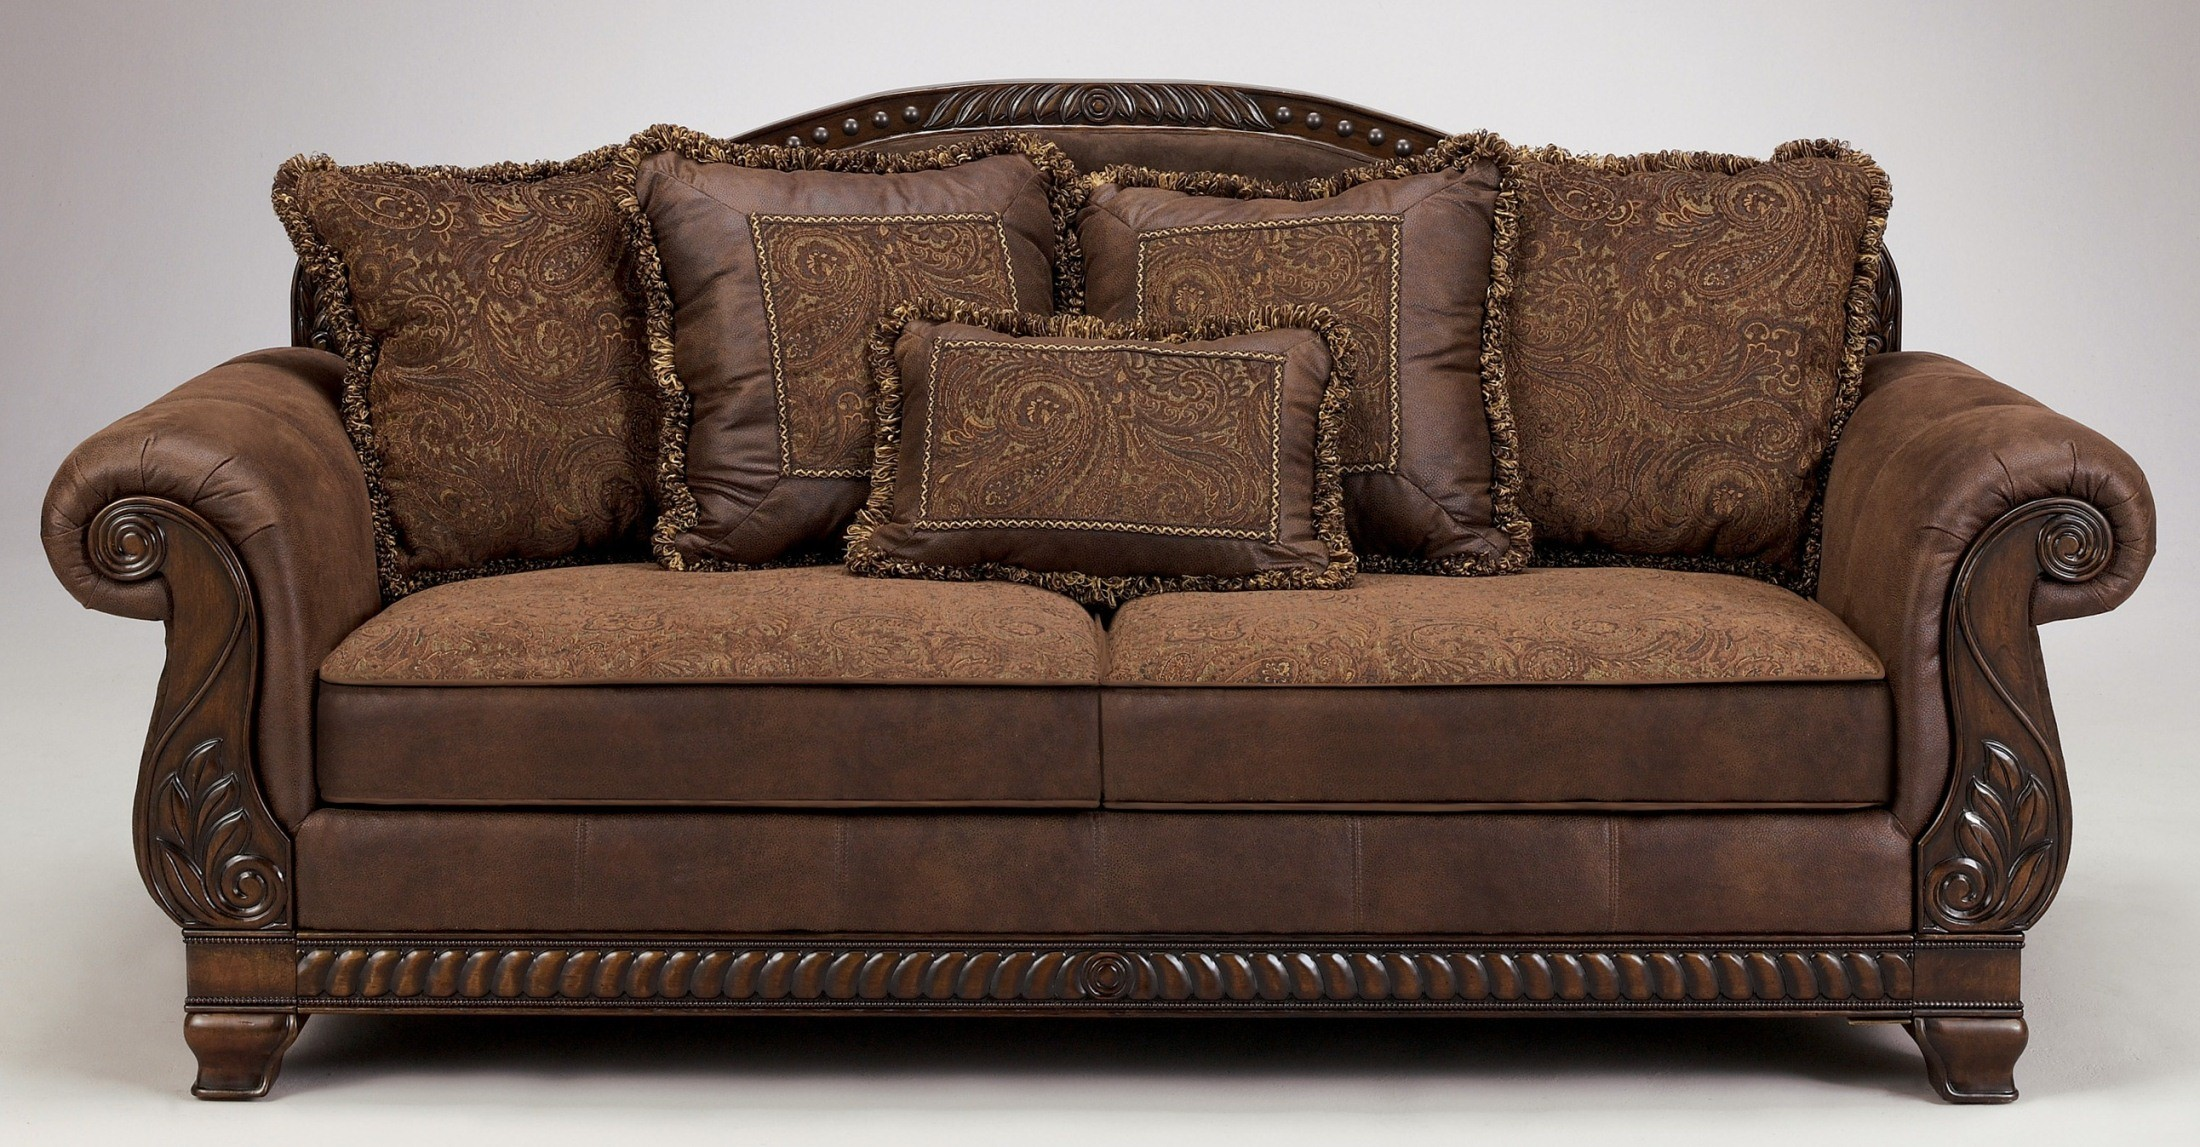 Bradington Truffle Sofa Ashley Furniture 1540038 Couch